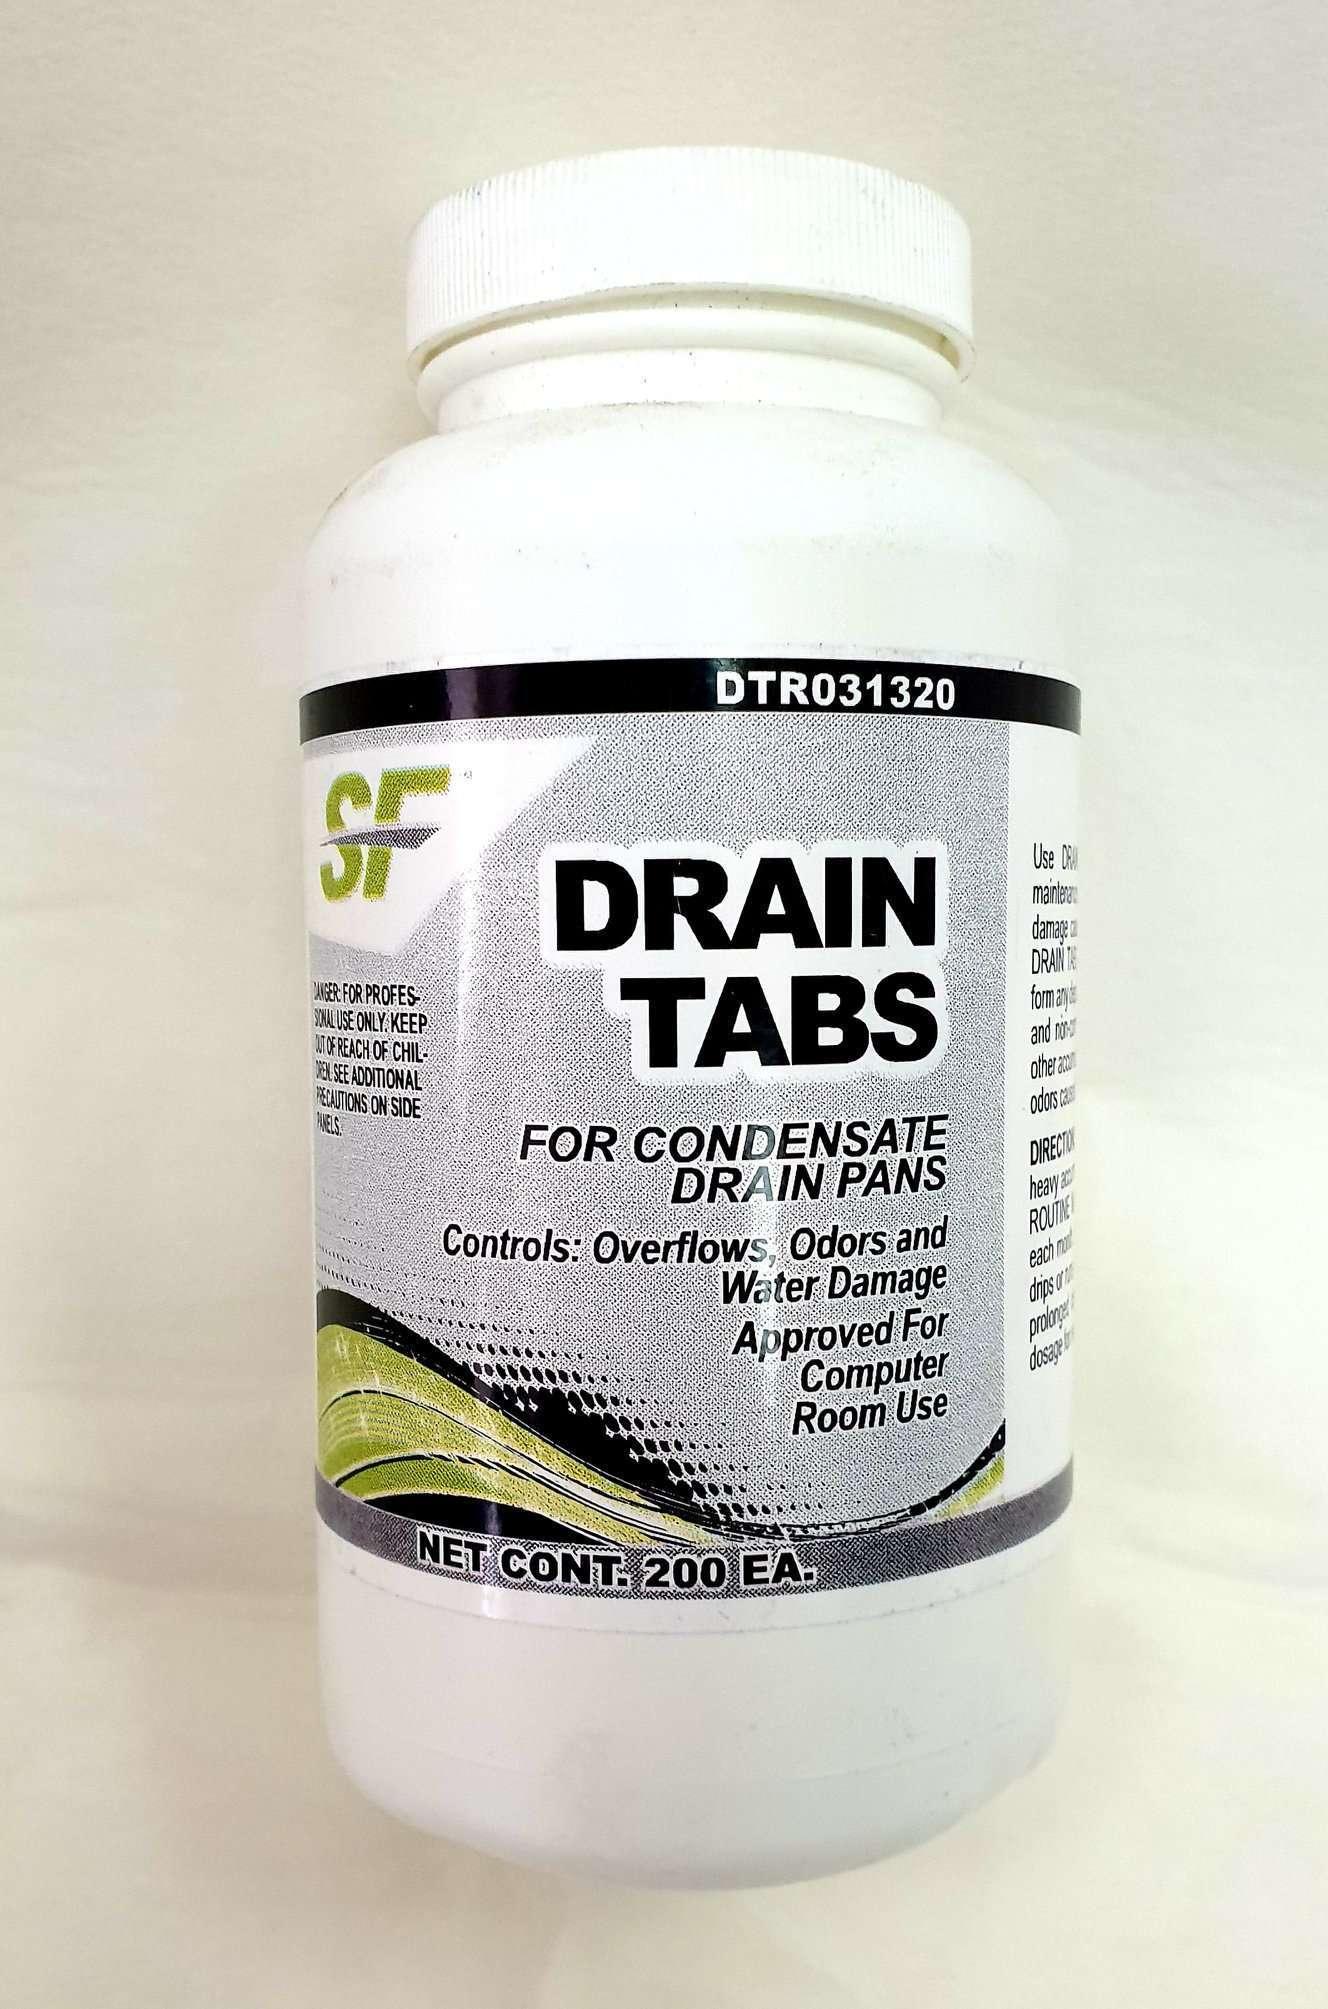 Sf trane condensate drain pan tabs, 200 pantabs dtr031320